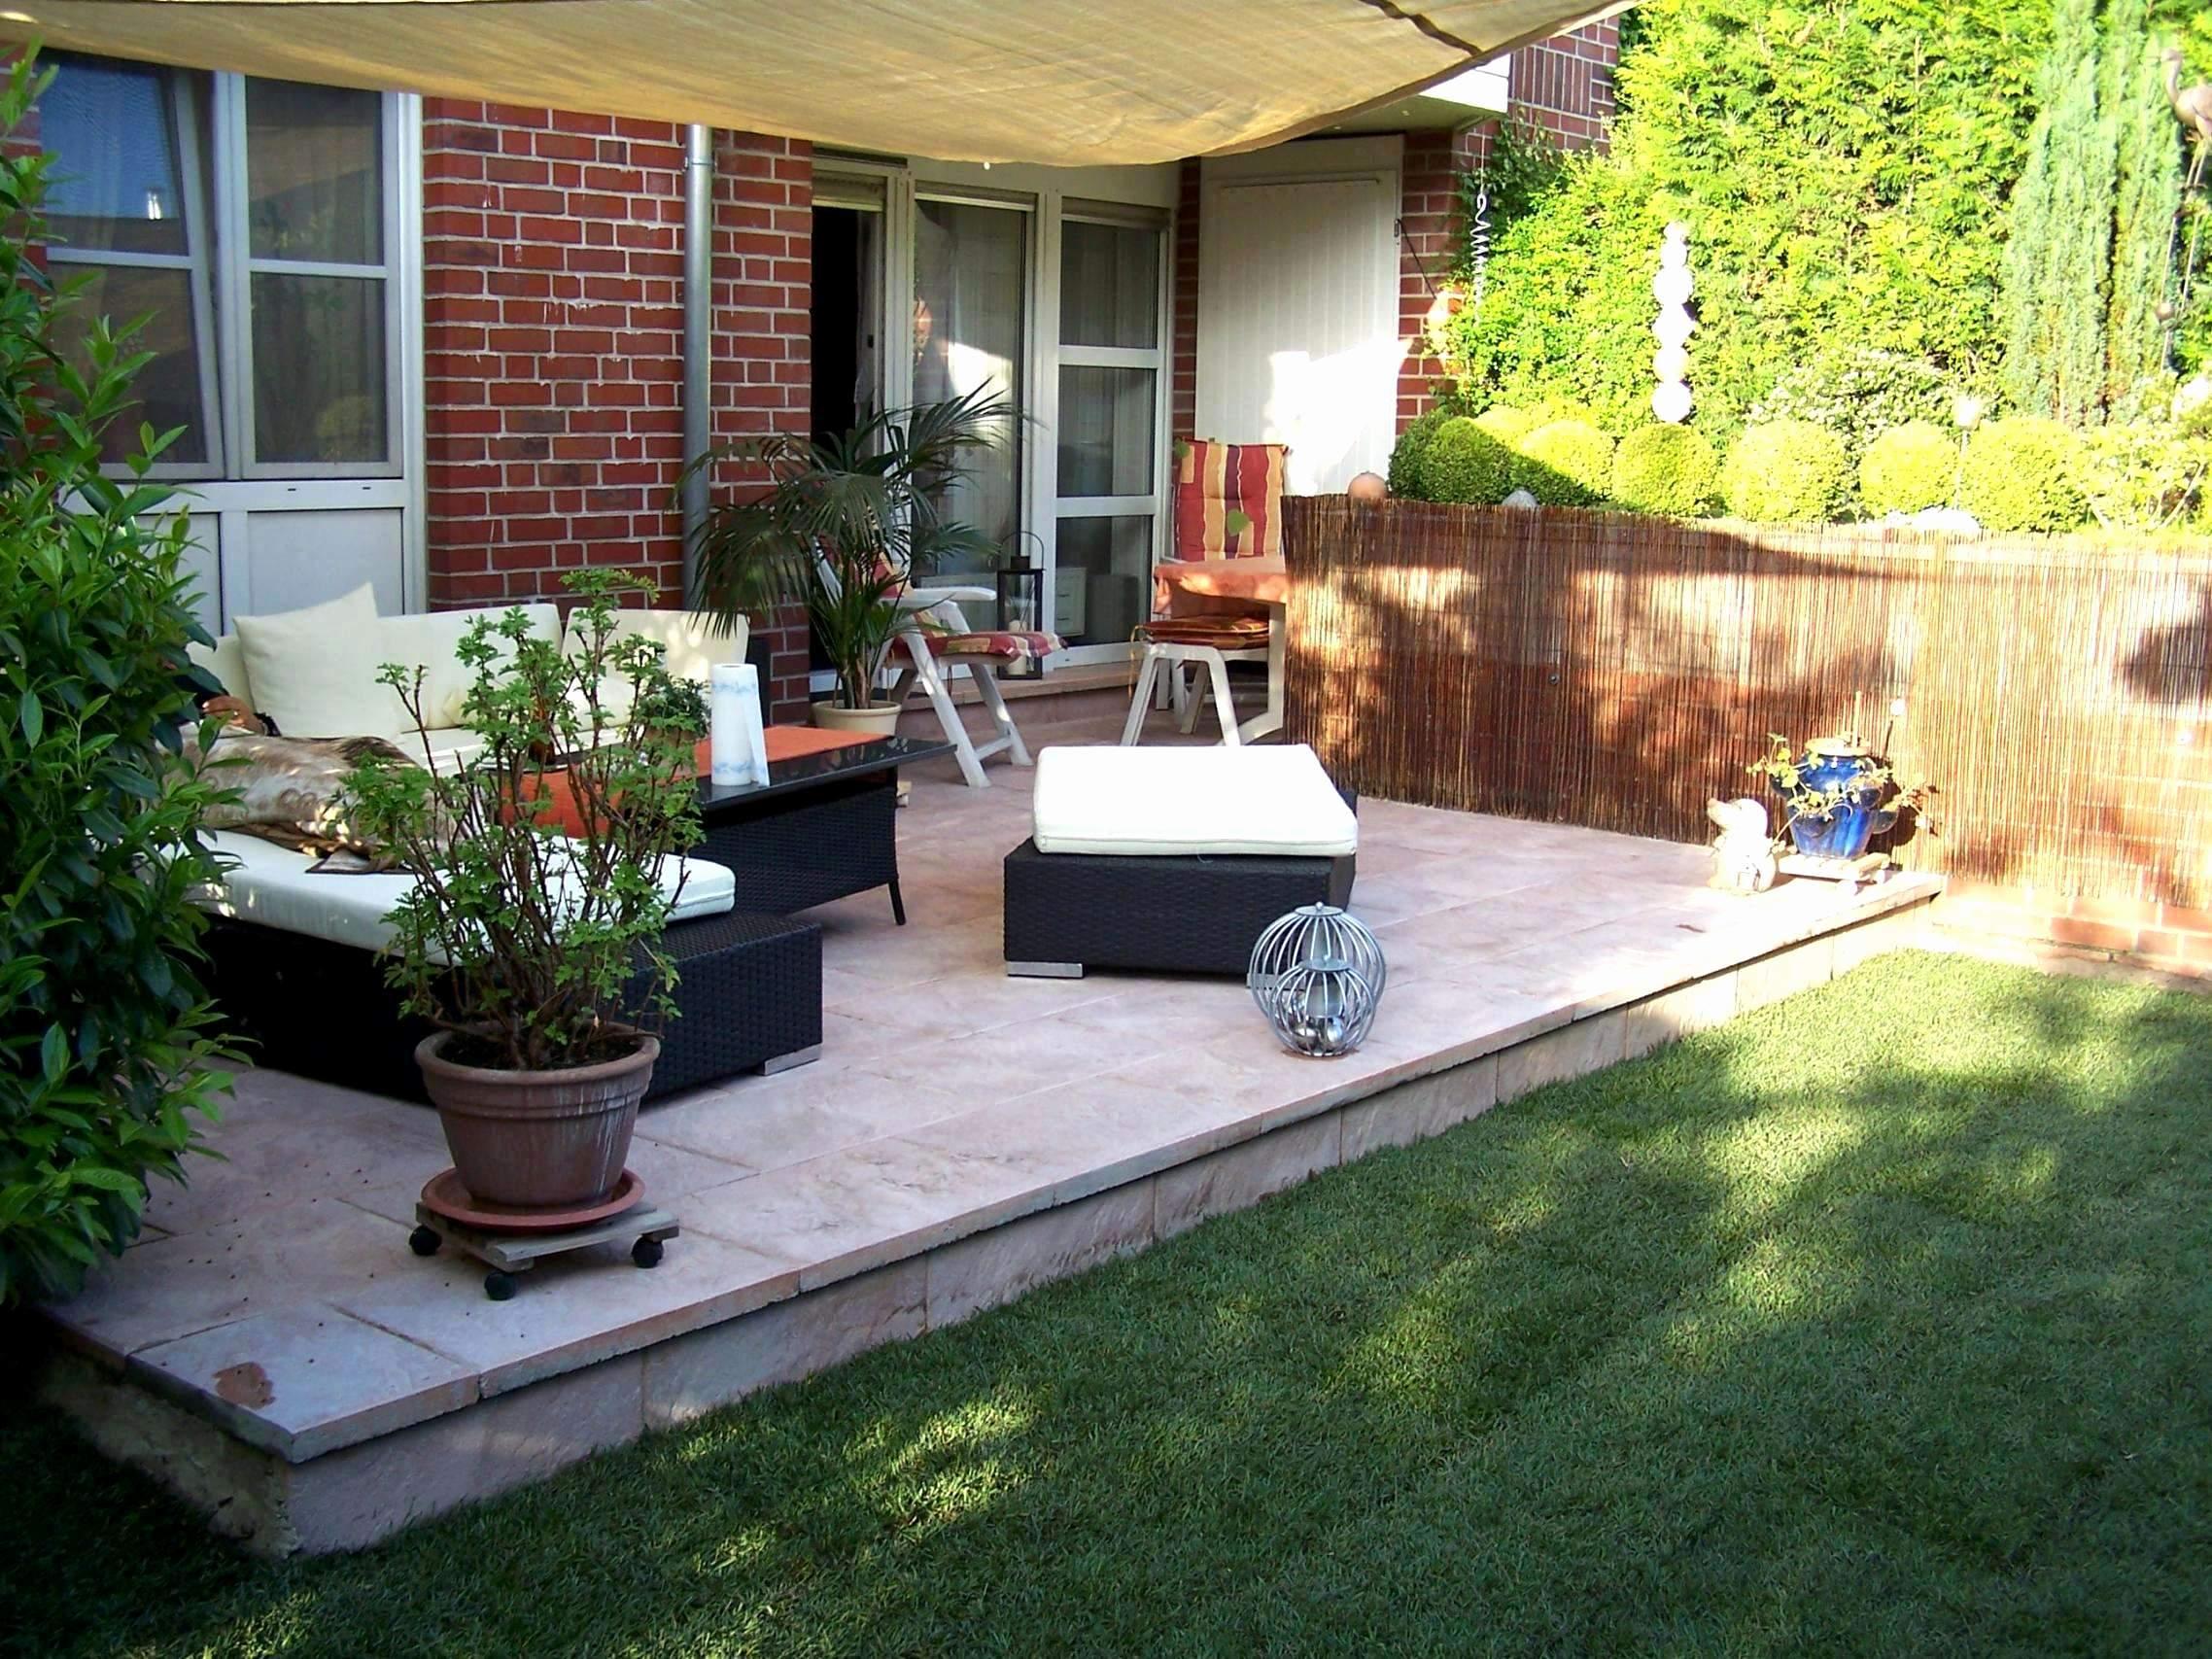 29 Neu Garten Terrasse Ideen Luxus Garten Anlegen